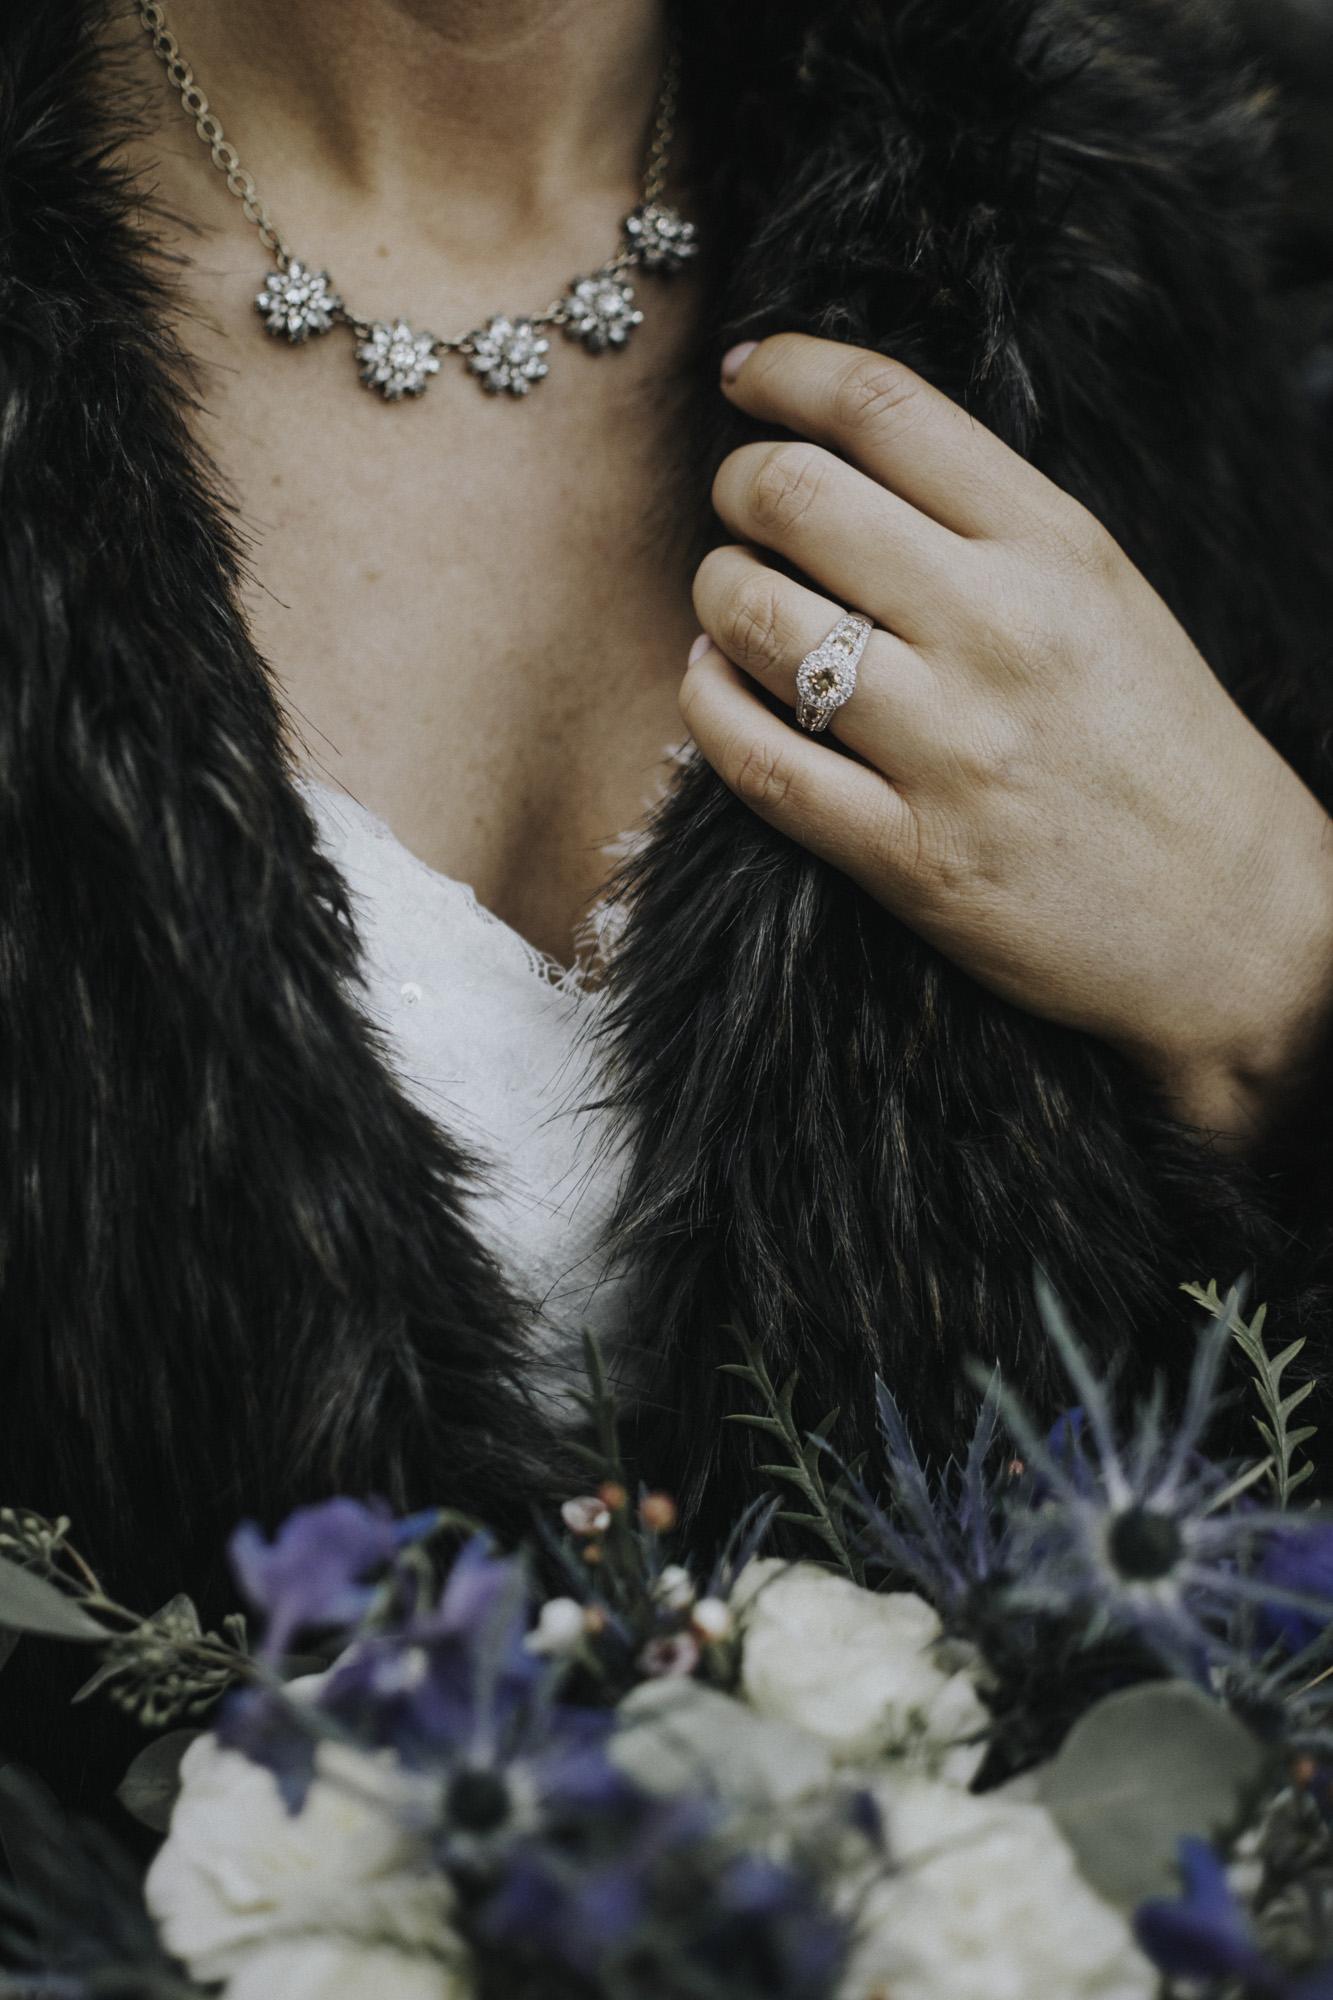 Cate_Ann_Photography_Dayton_Ohio_Wedding_Elopement_And_Engagement_PhotographerDSC_6098.jpg